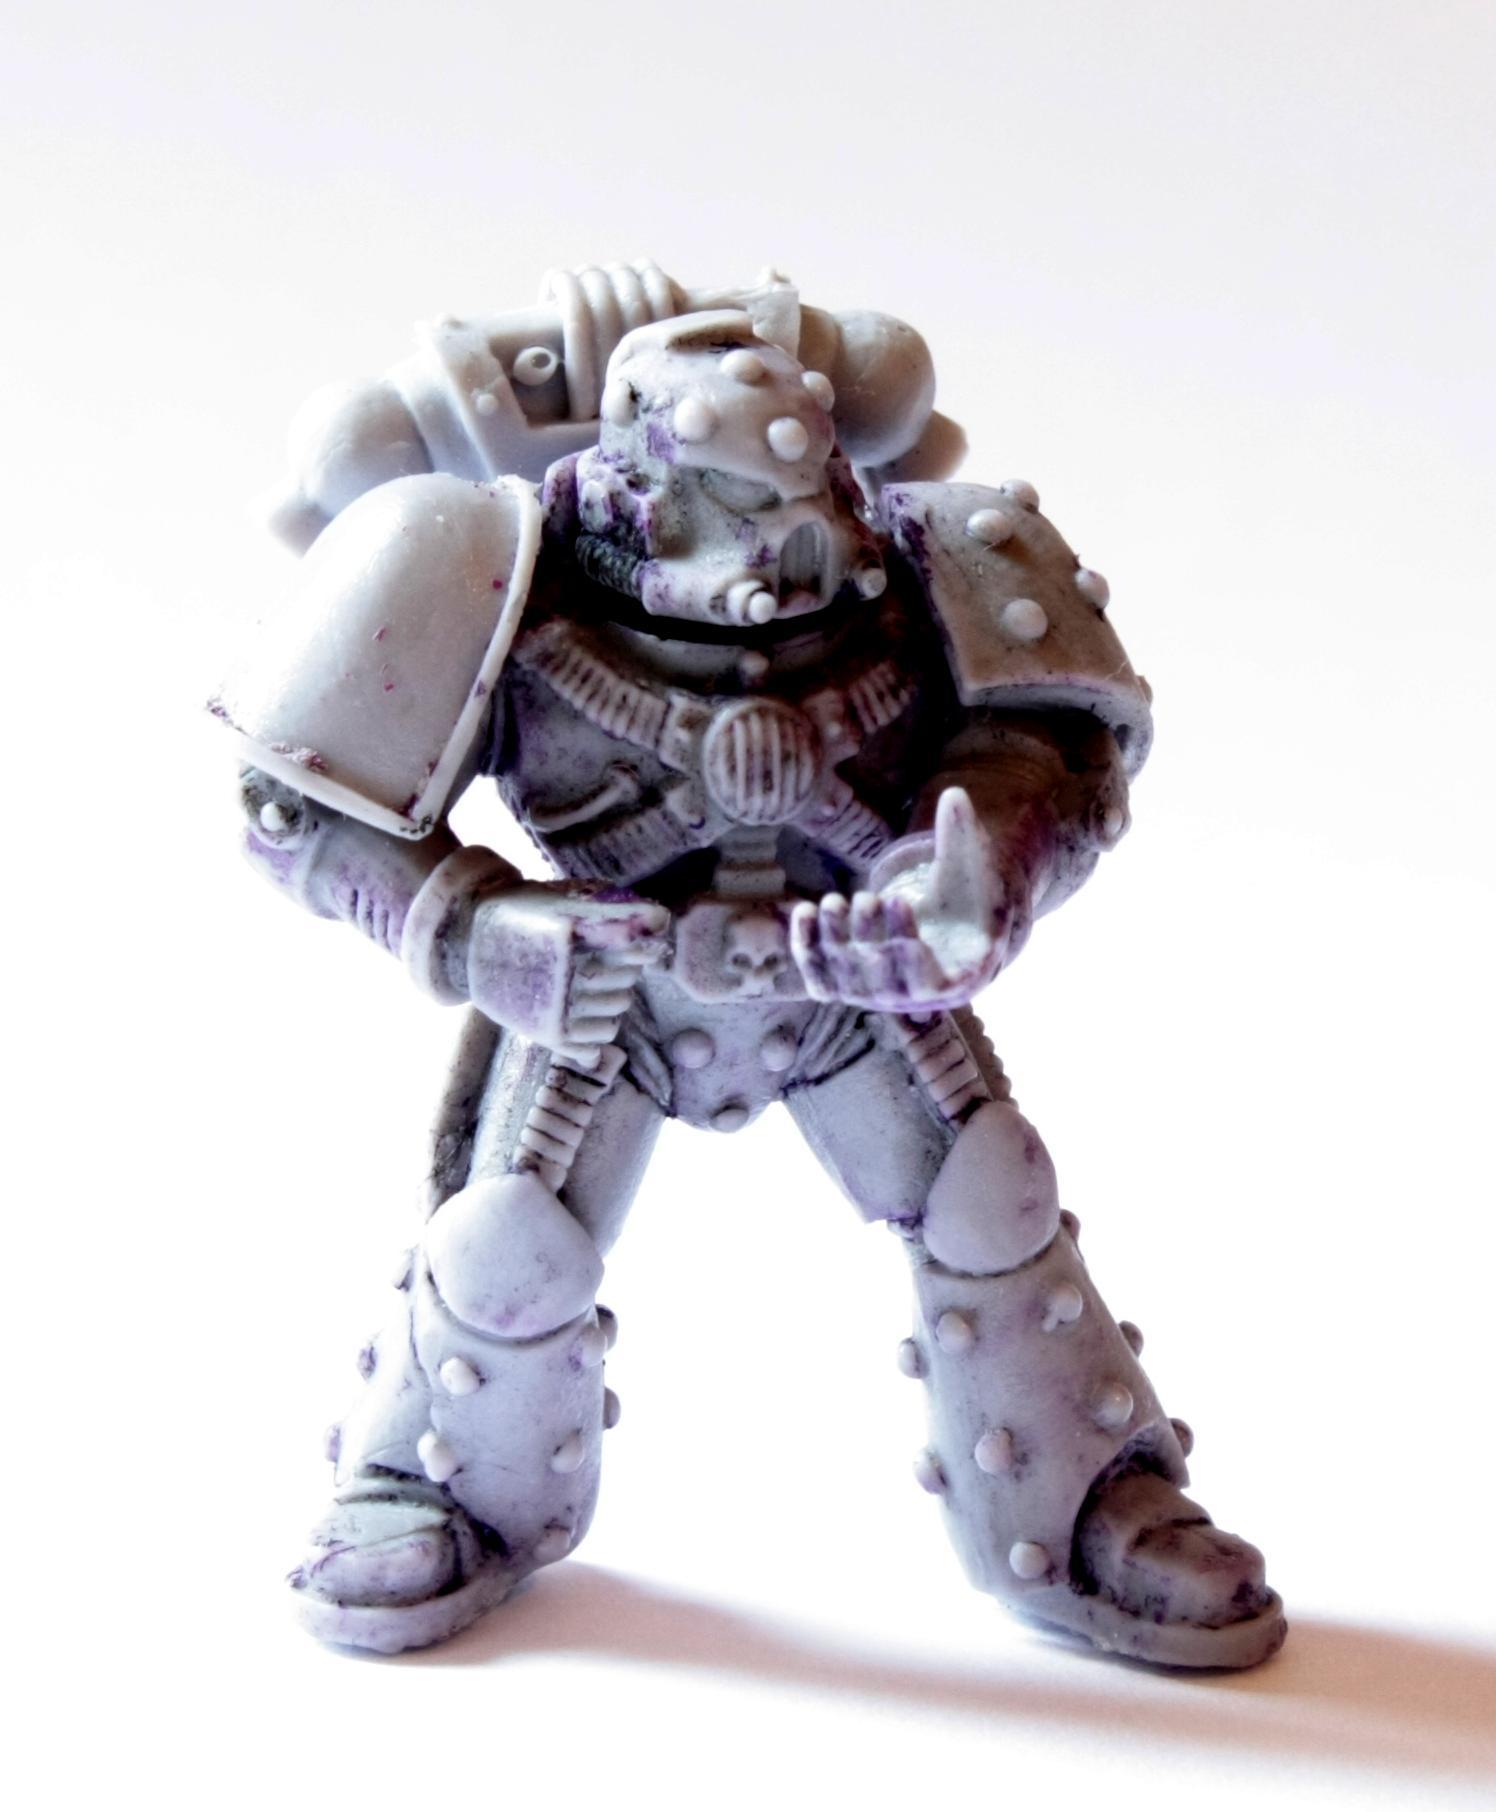 Chaos Space Marines, Ec, Emperor's Children, Slaanesh, Space Marines